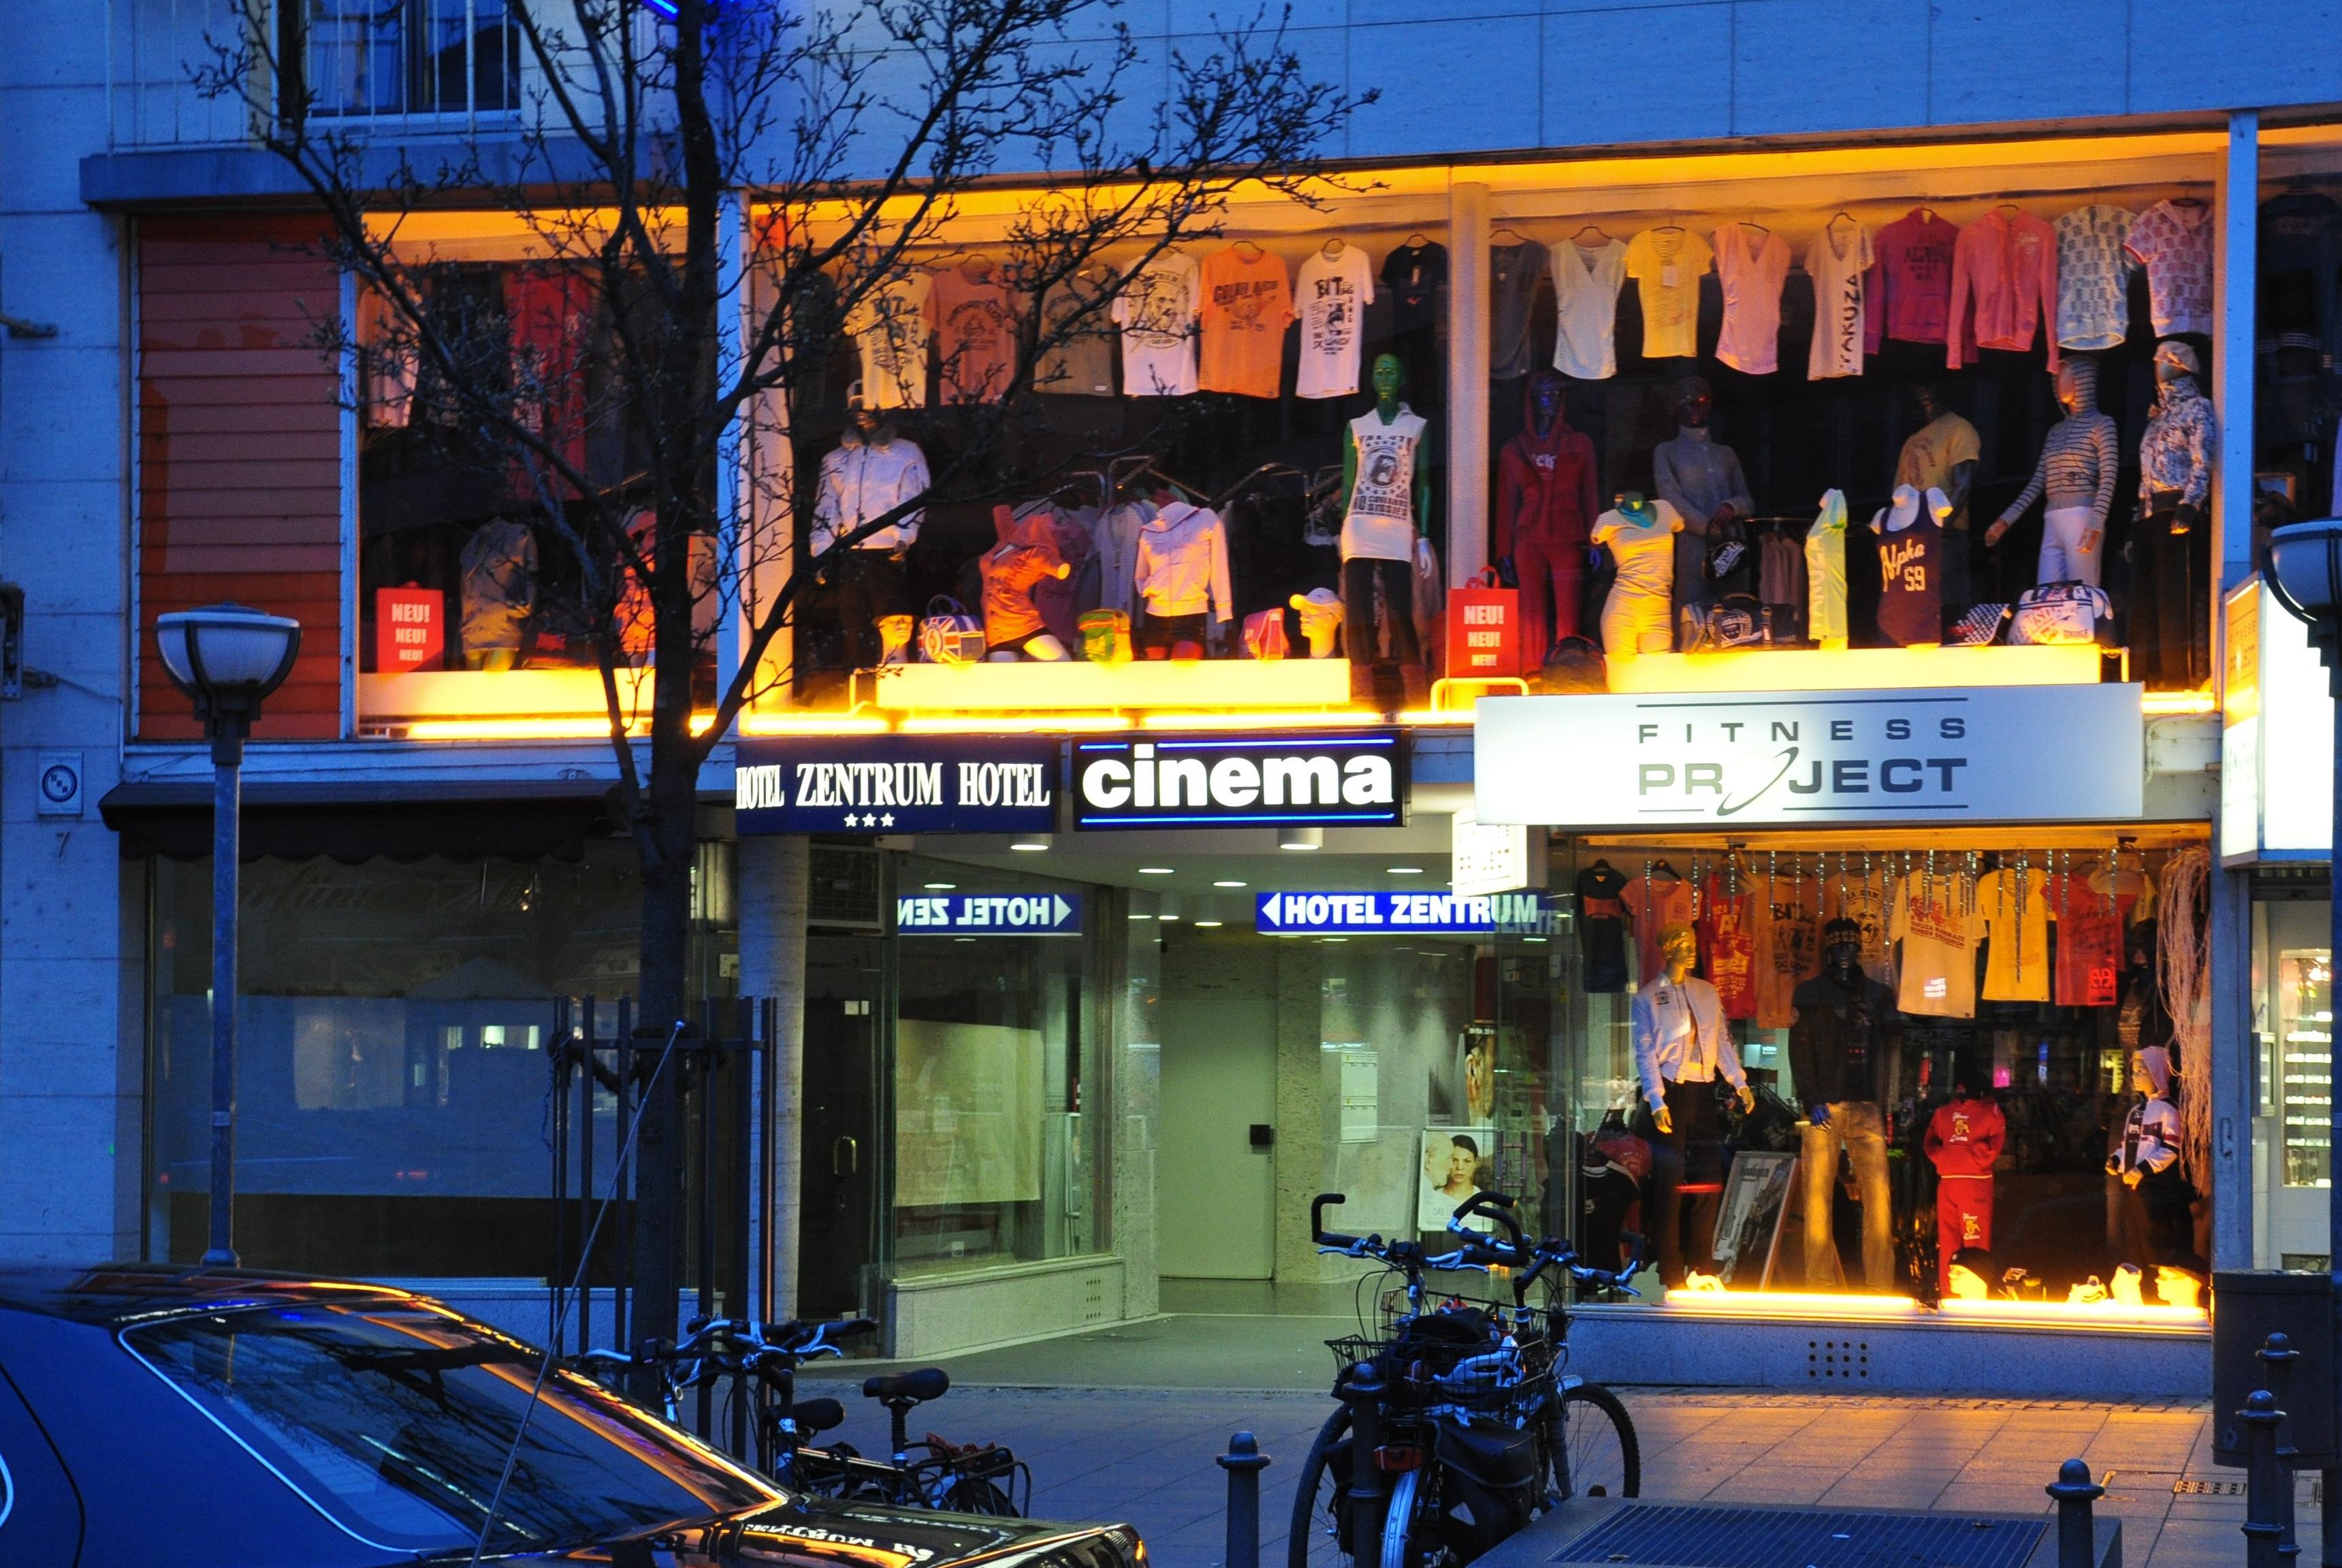 File:Frankfurt Cinema Roßmarkt7.jpg - Wikimedia Commons